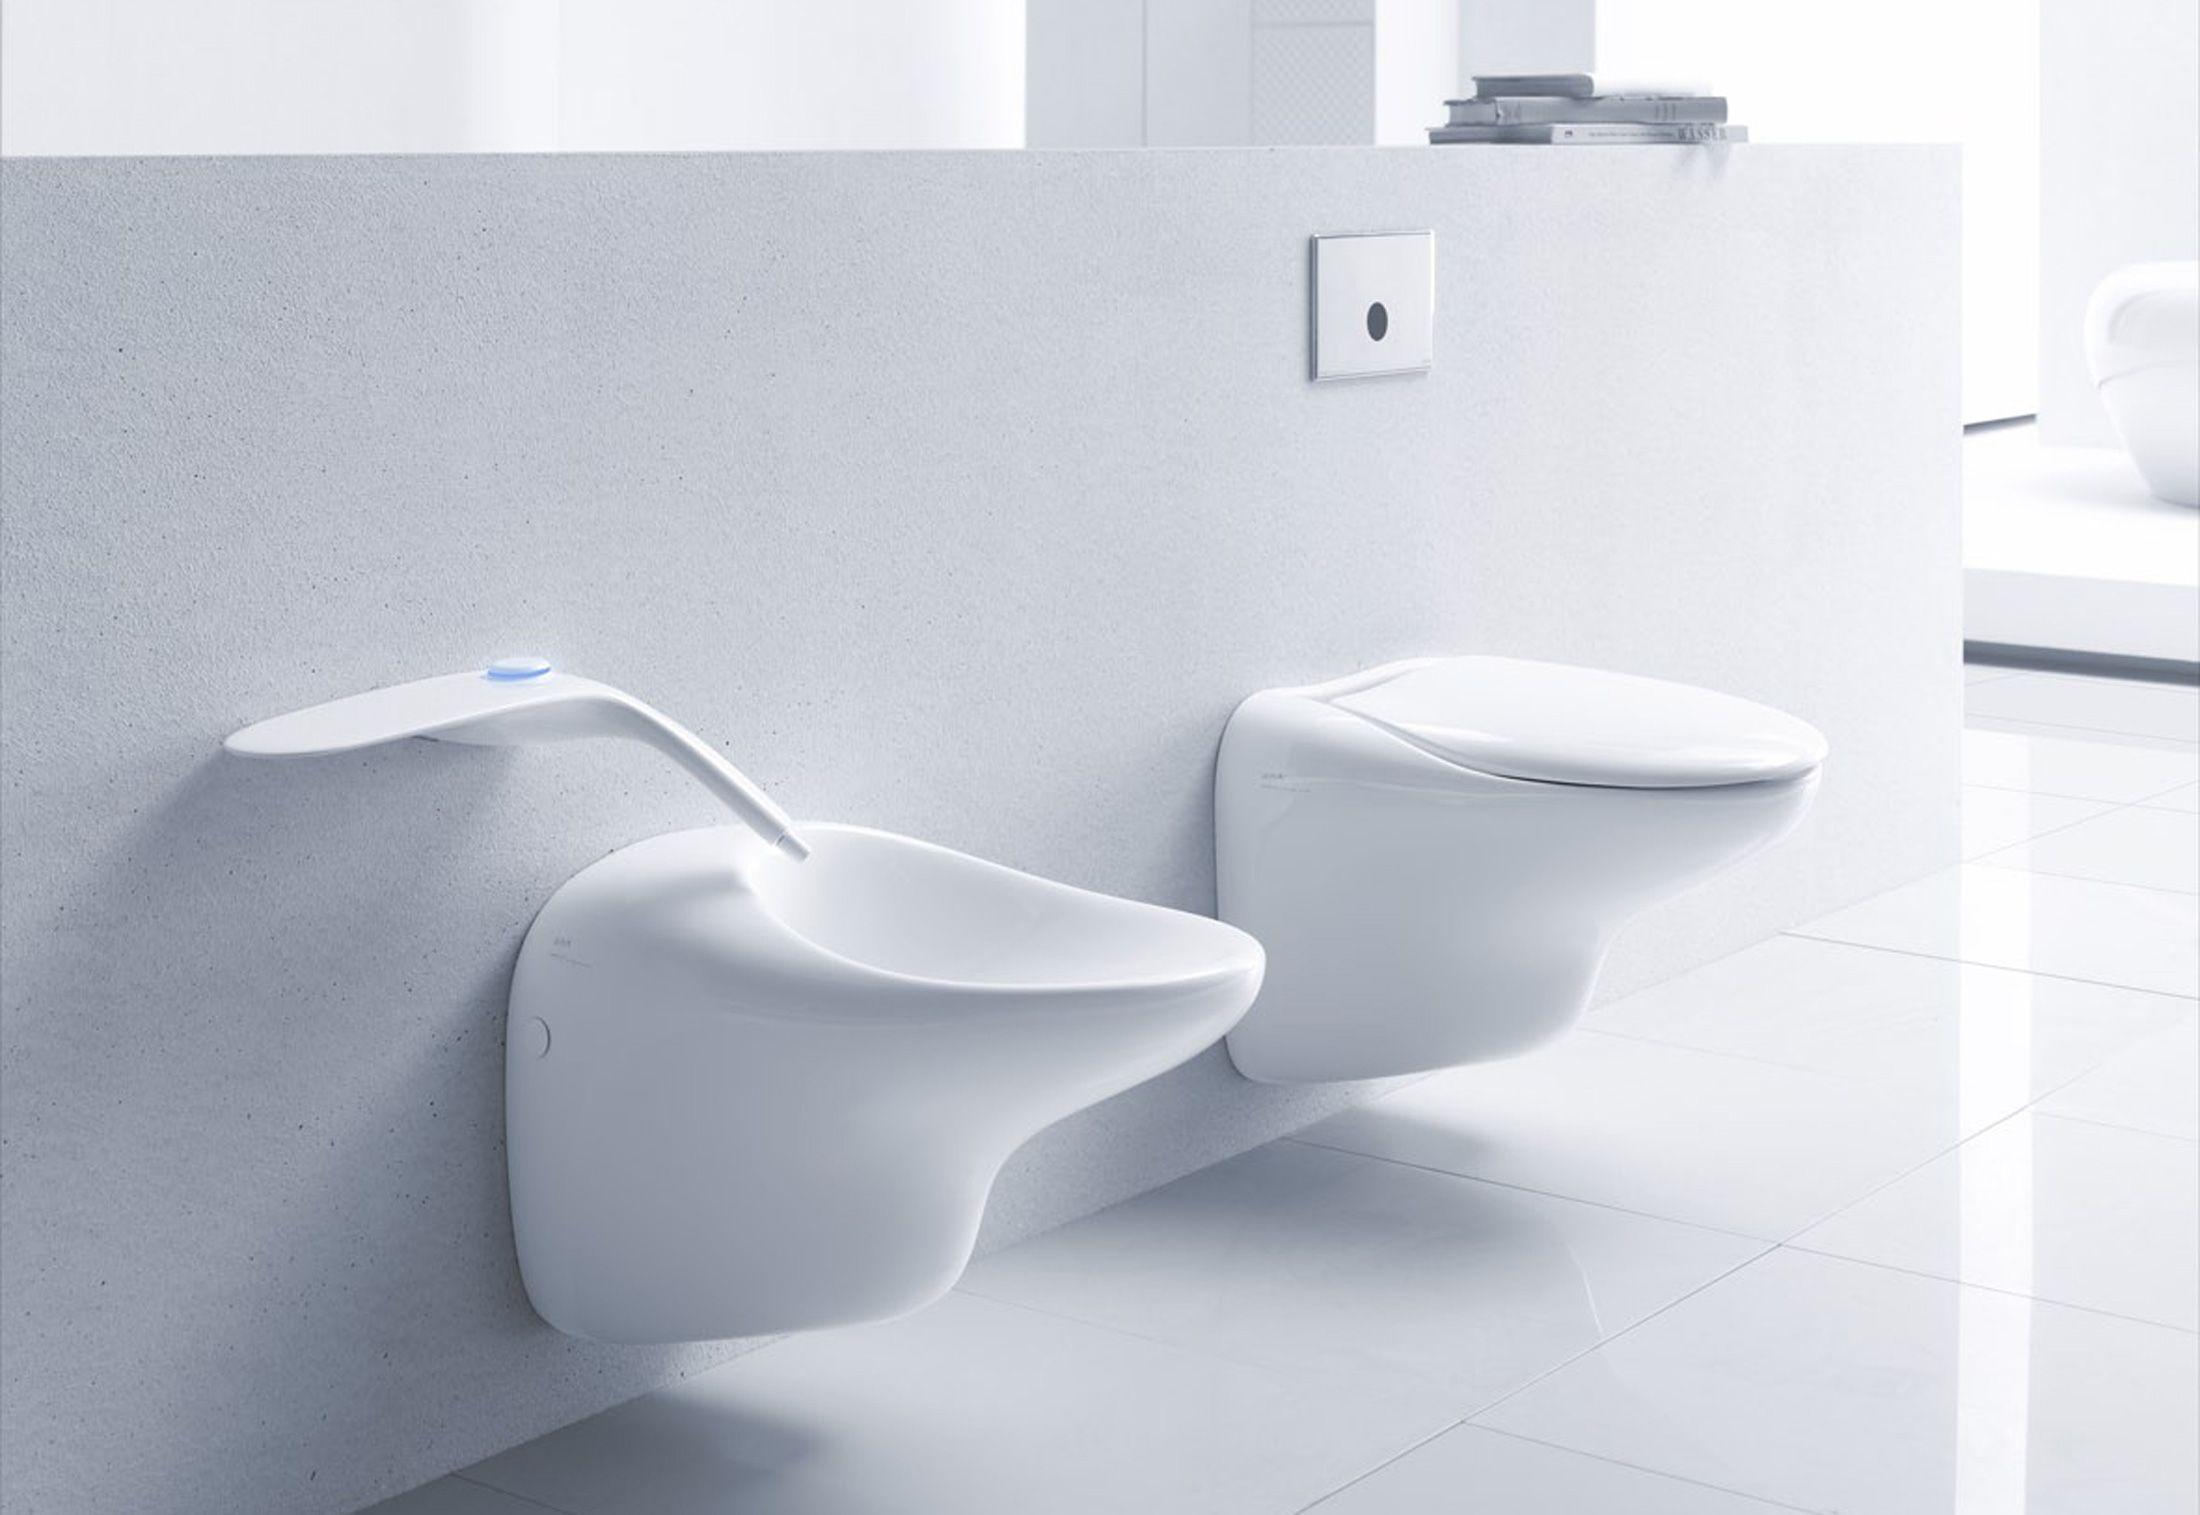 ross lovegrove beleuchtung ty nant ross lovegrove vitra bathroom freedom wc and bidet